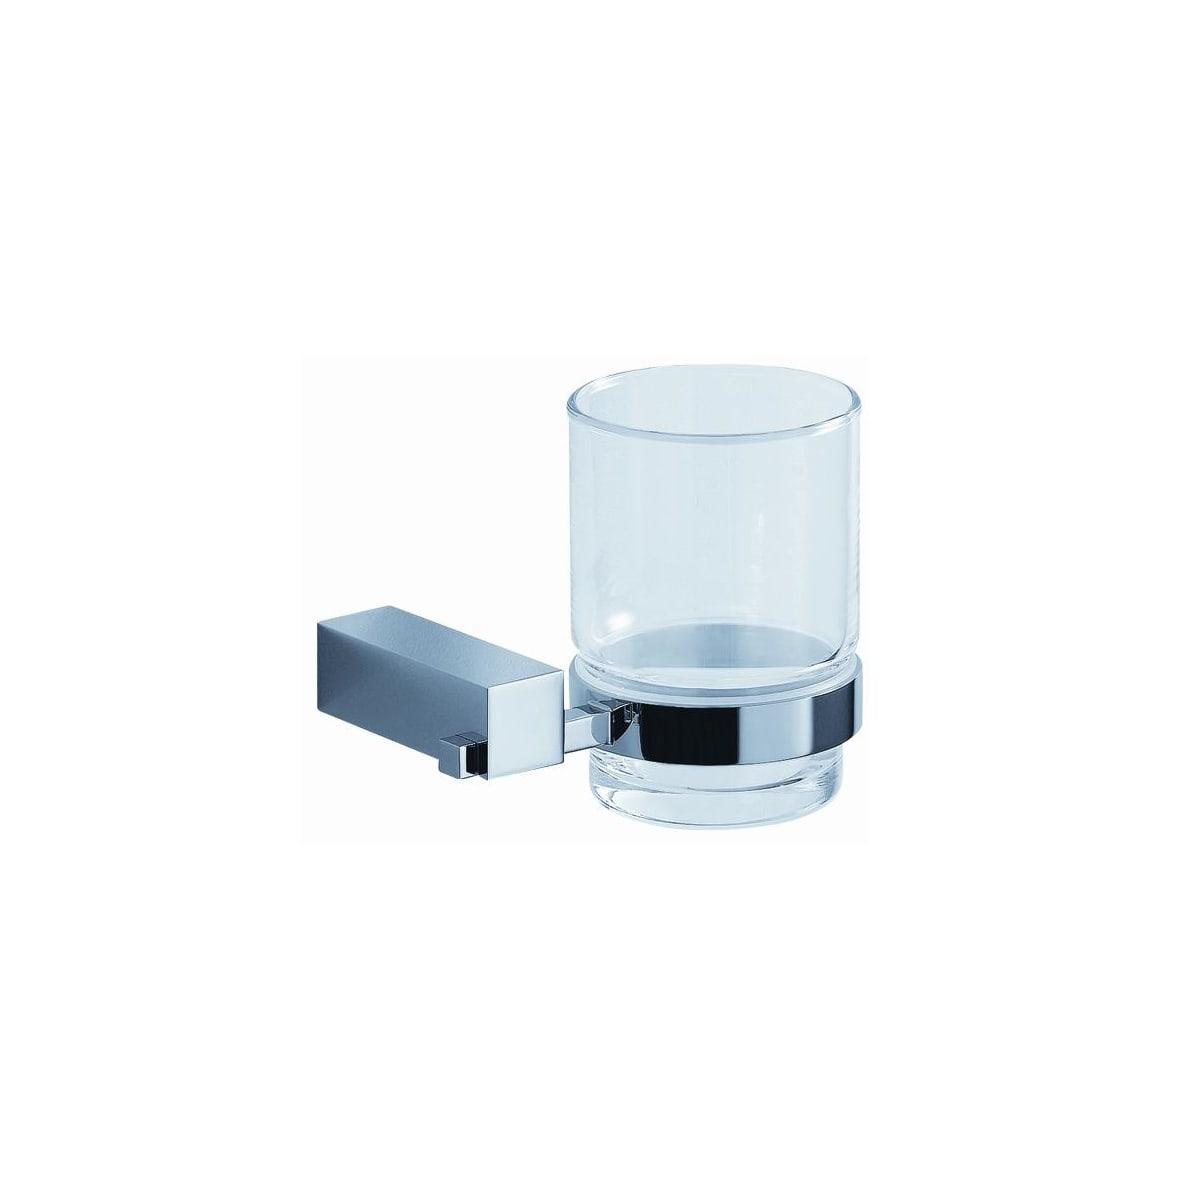 Fresca Fac0410 Chrome Ottimo 4 25 Wide Wall Mounted Tumbler Holder Faucet Com